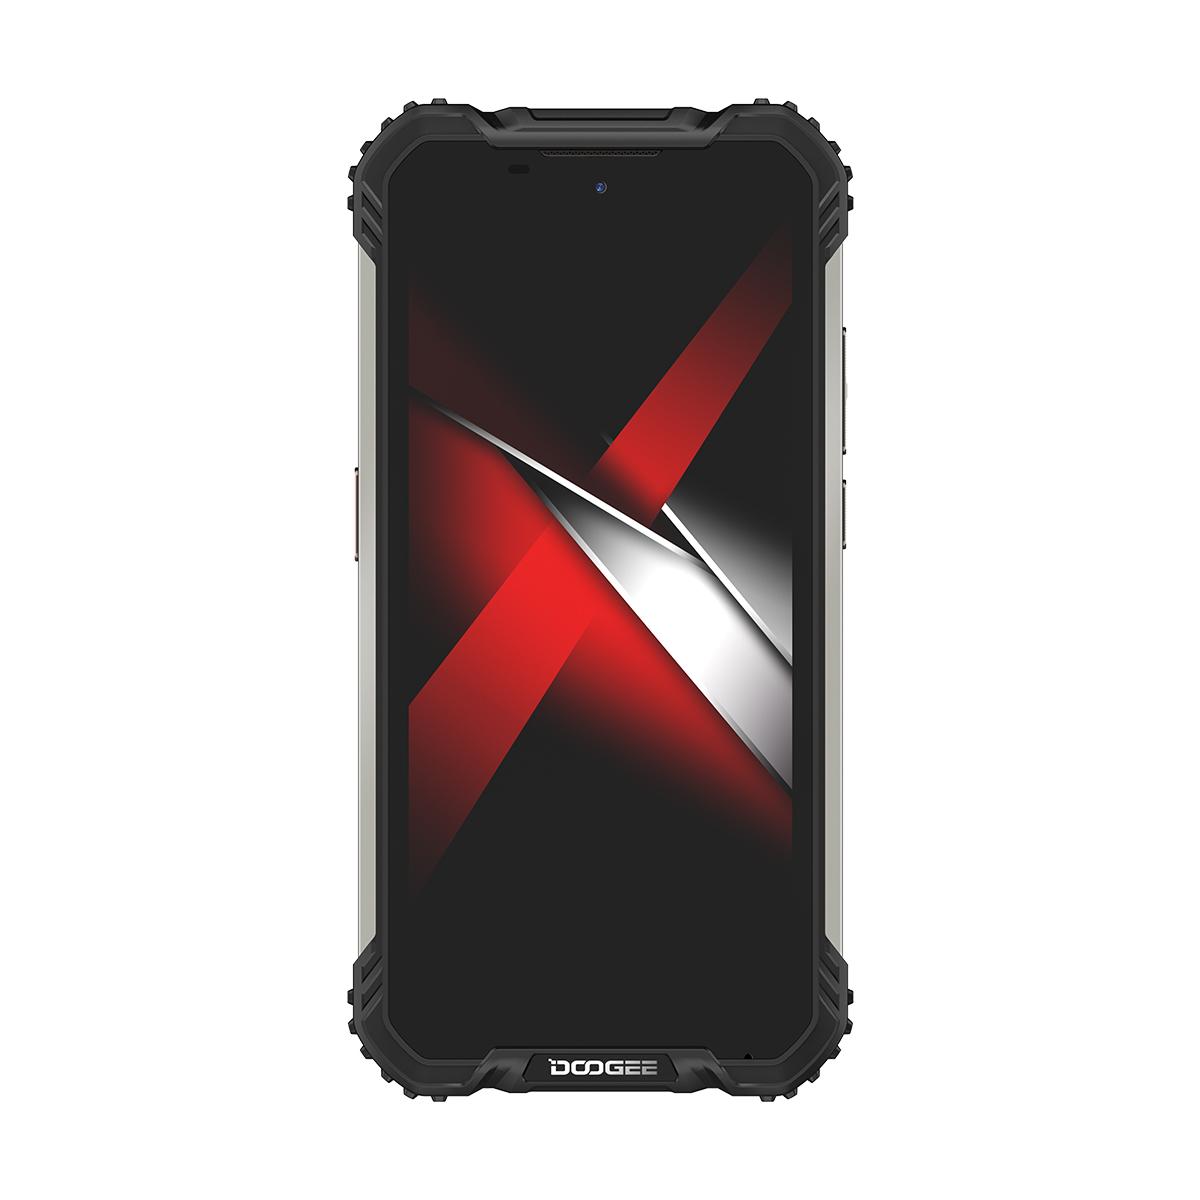 DOOGEE S58 Pro Global Version 5.71 inch IP68/IP69K Waterproof NFC 5180mAh Android 10 16MP AI Triple Rear Camera 6GB 64GB Helio P22 4G Smartphone